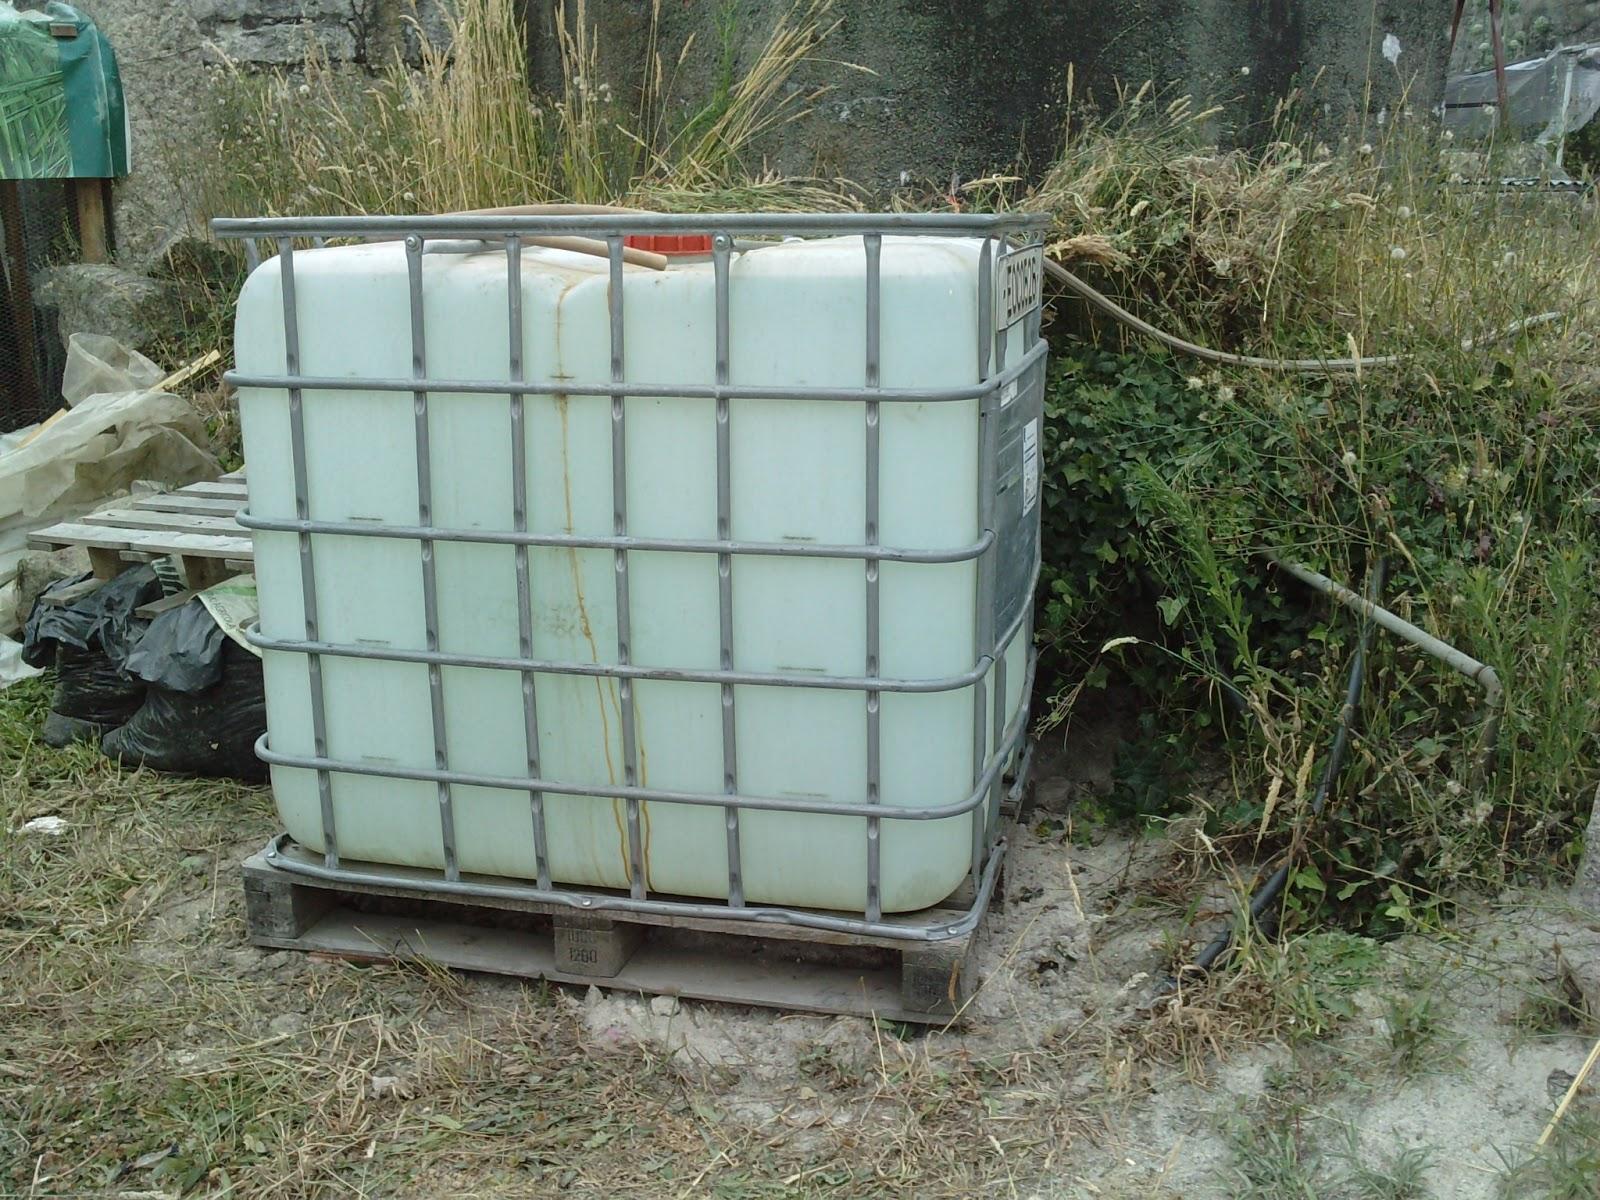 Horta dos tr s ao s bado sistema rega ii - Deposito de agua 1000 litros ...